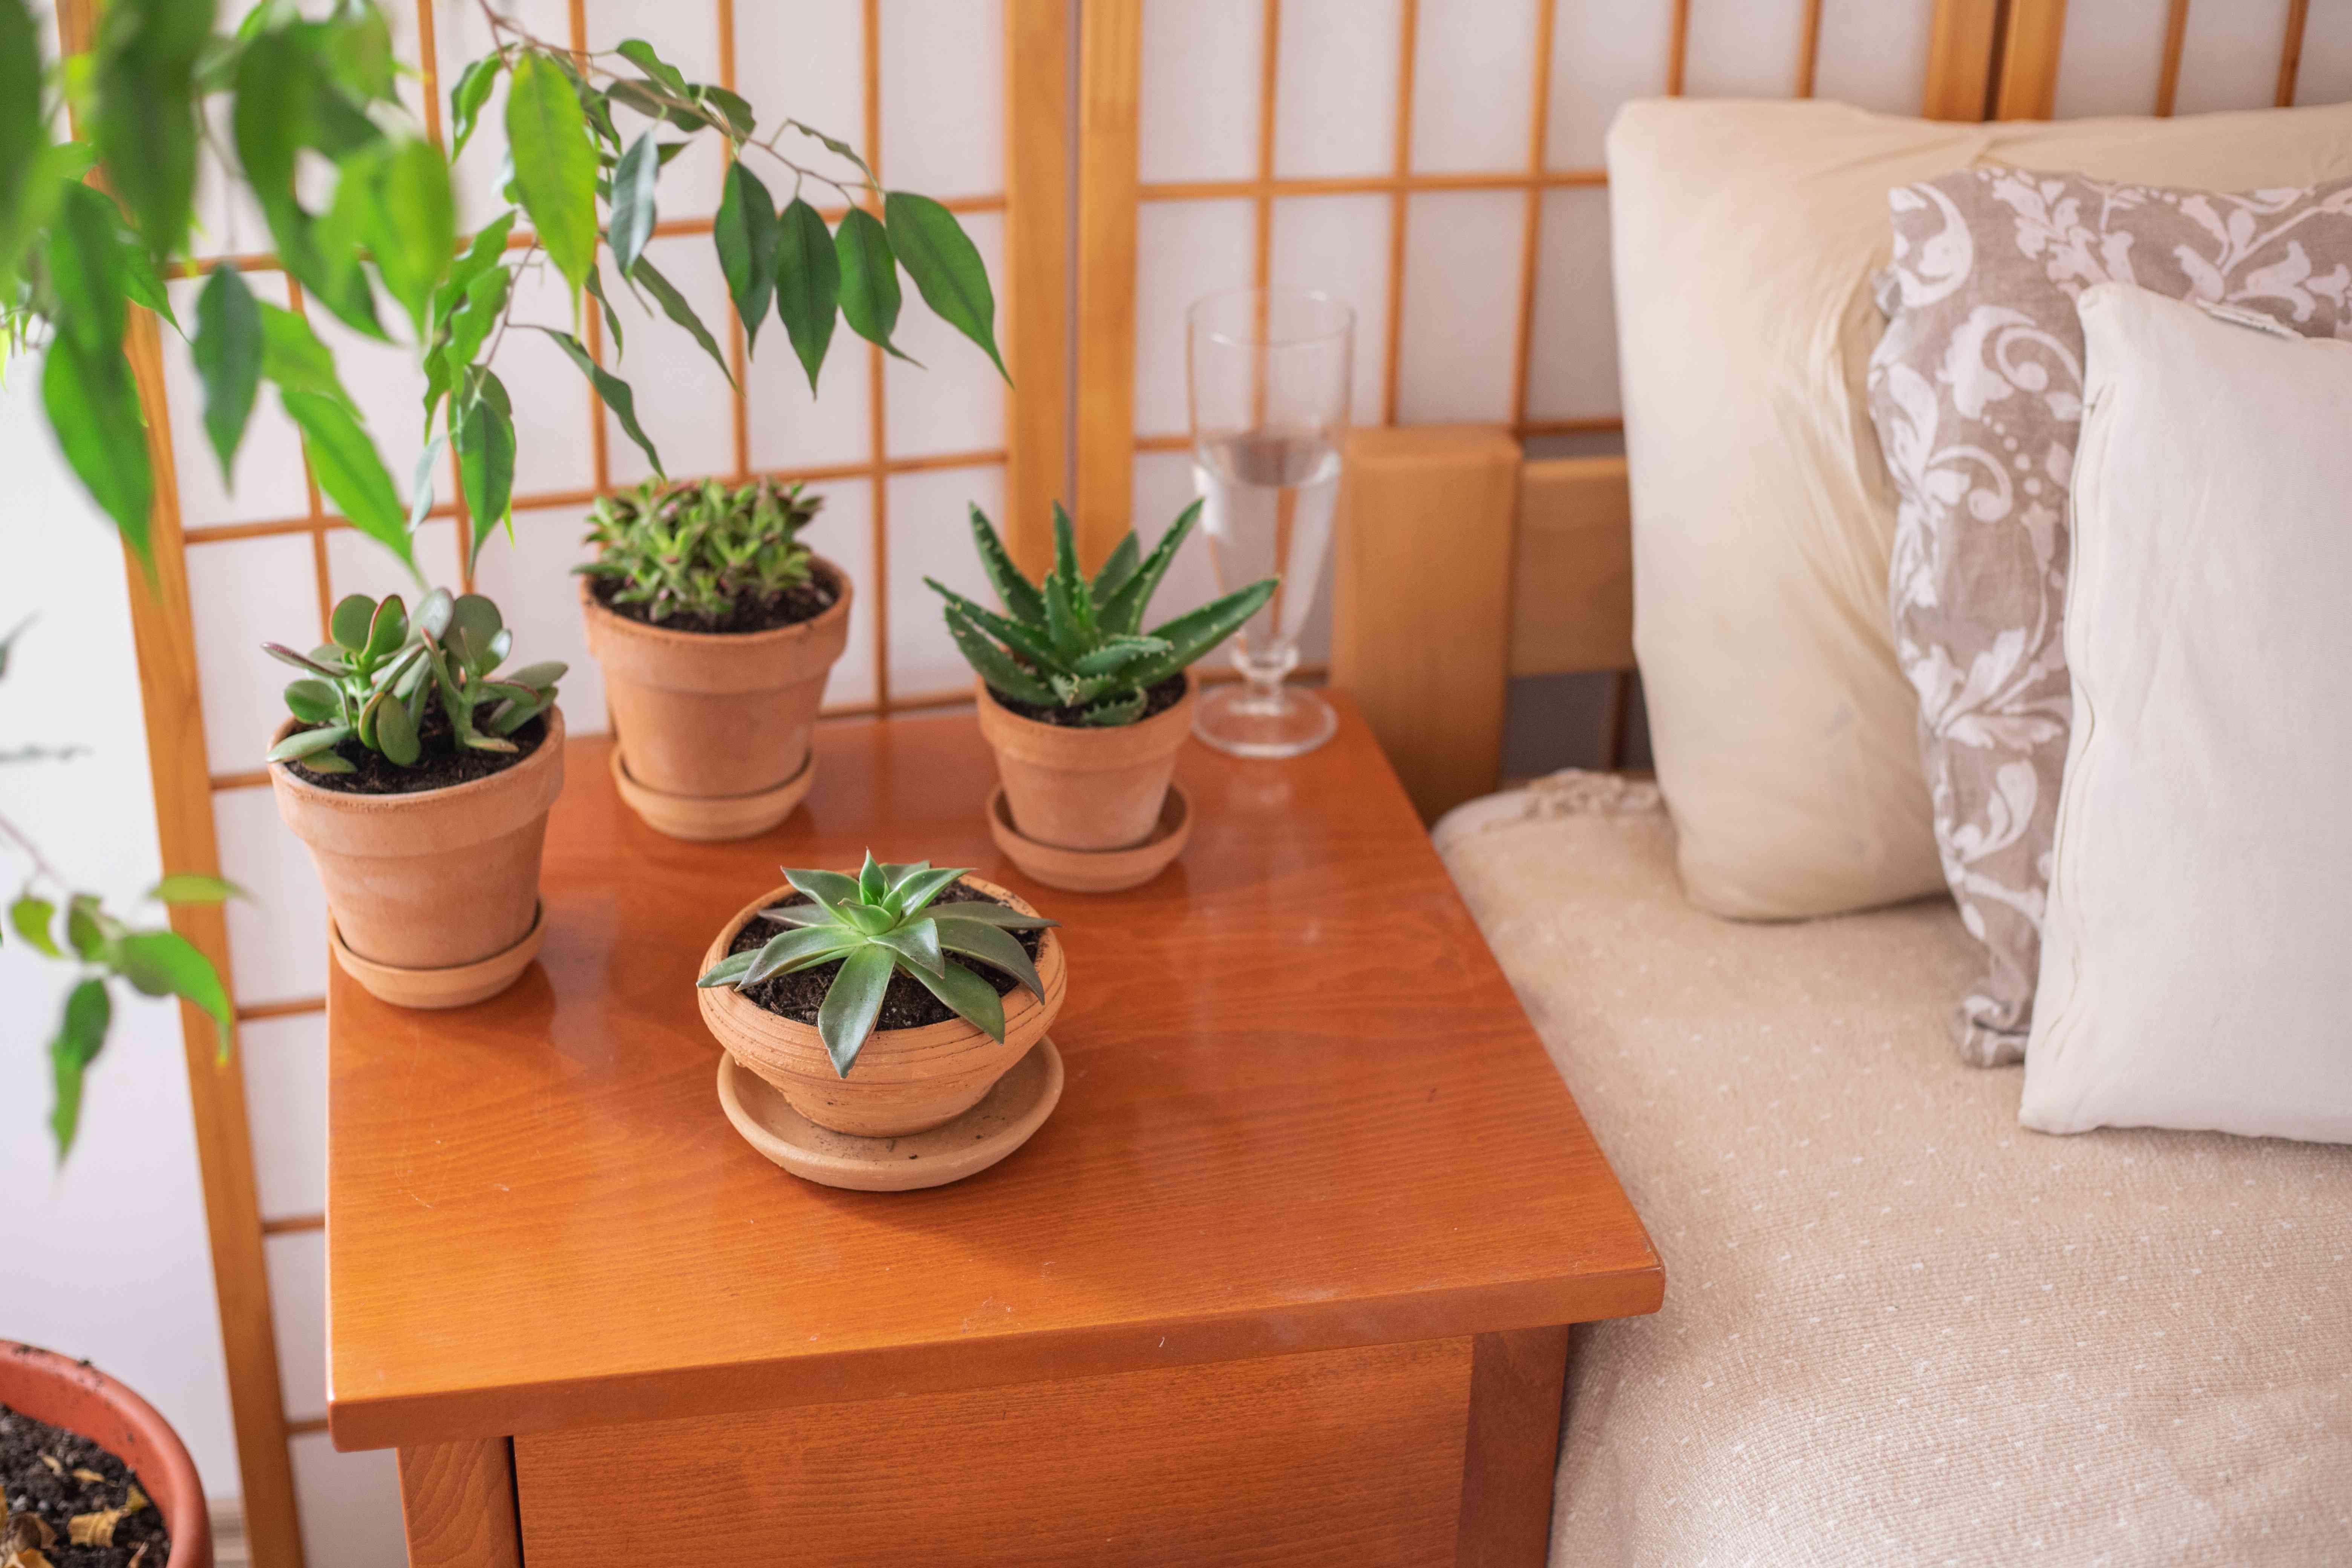 terra cotta pots with succulents near bedroom